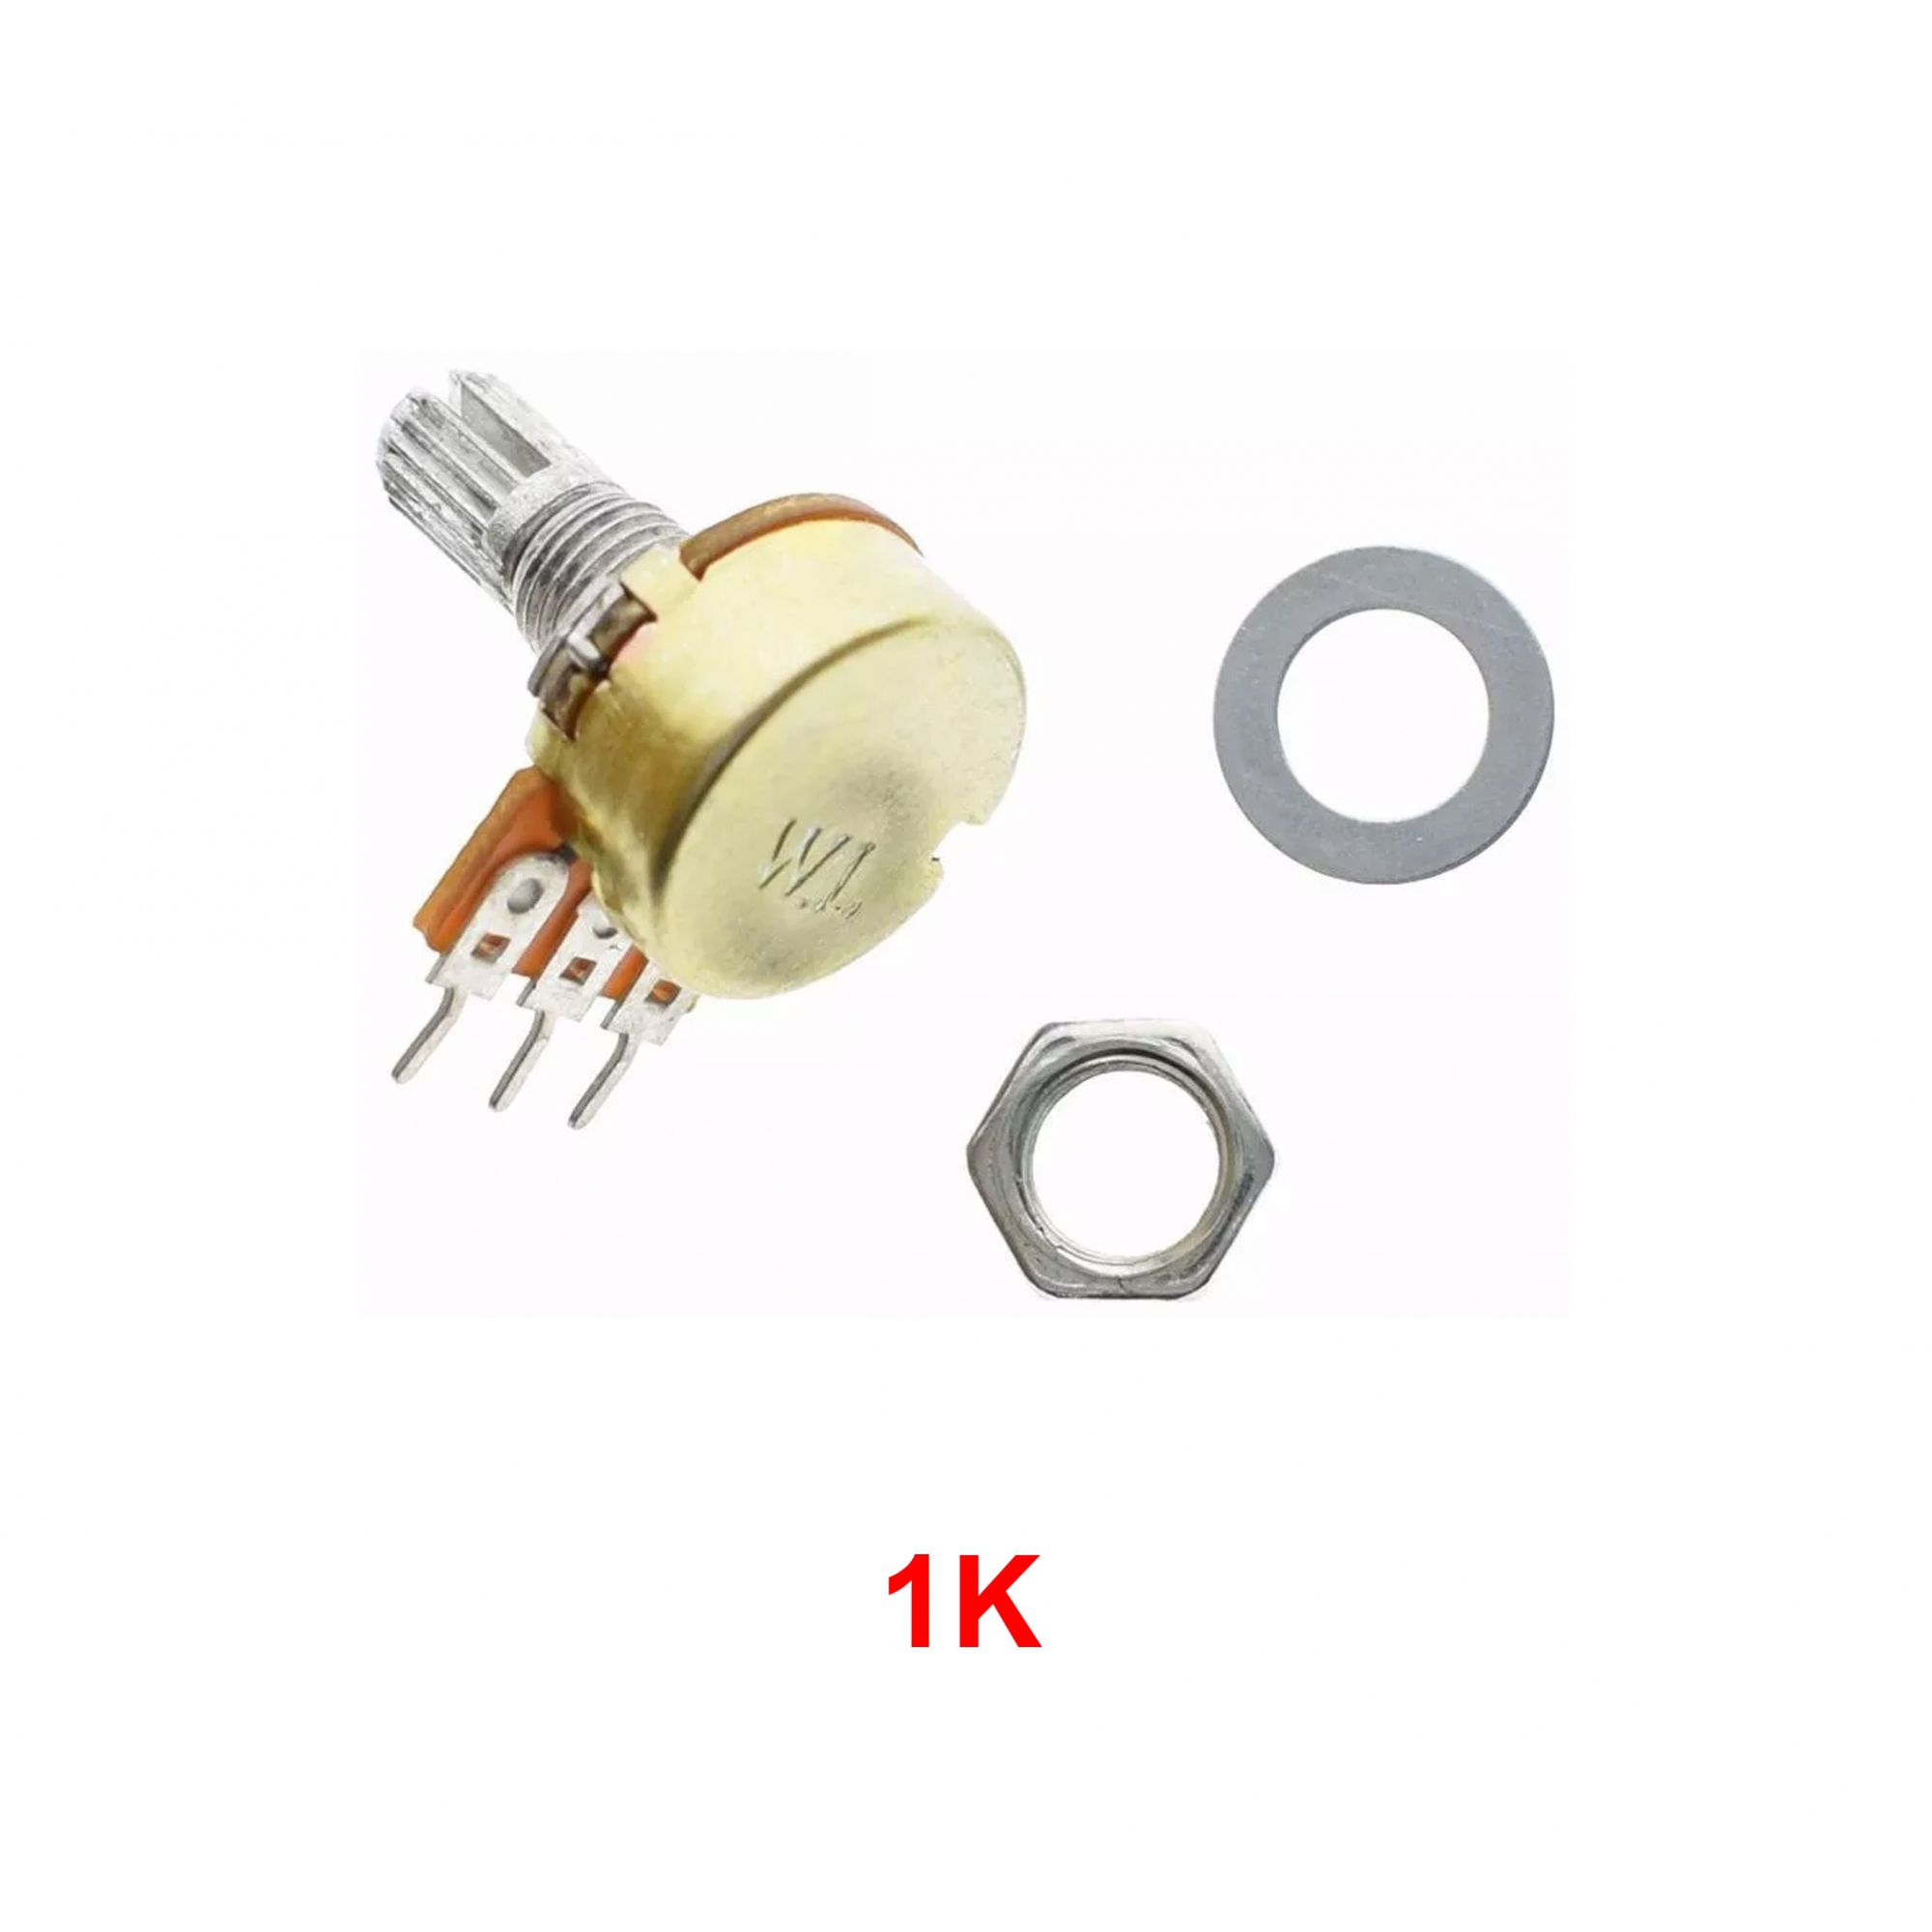 Kit com 3 Potenciômetro Linear Estriado: 1k, 5k e 10k.